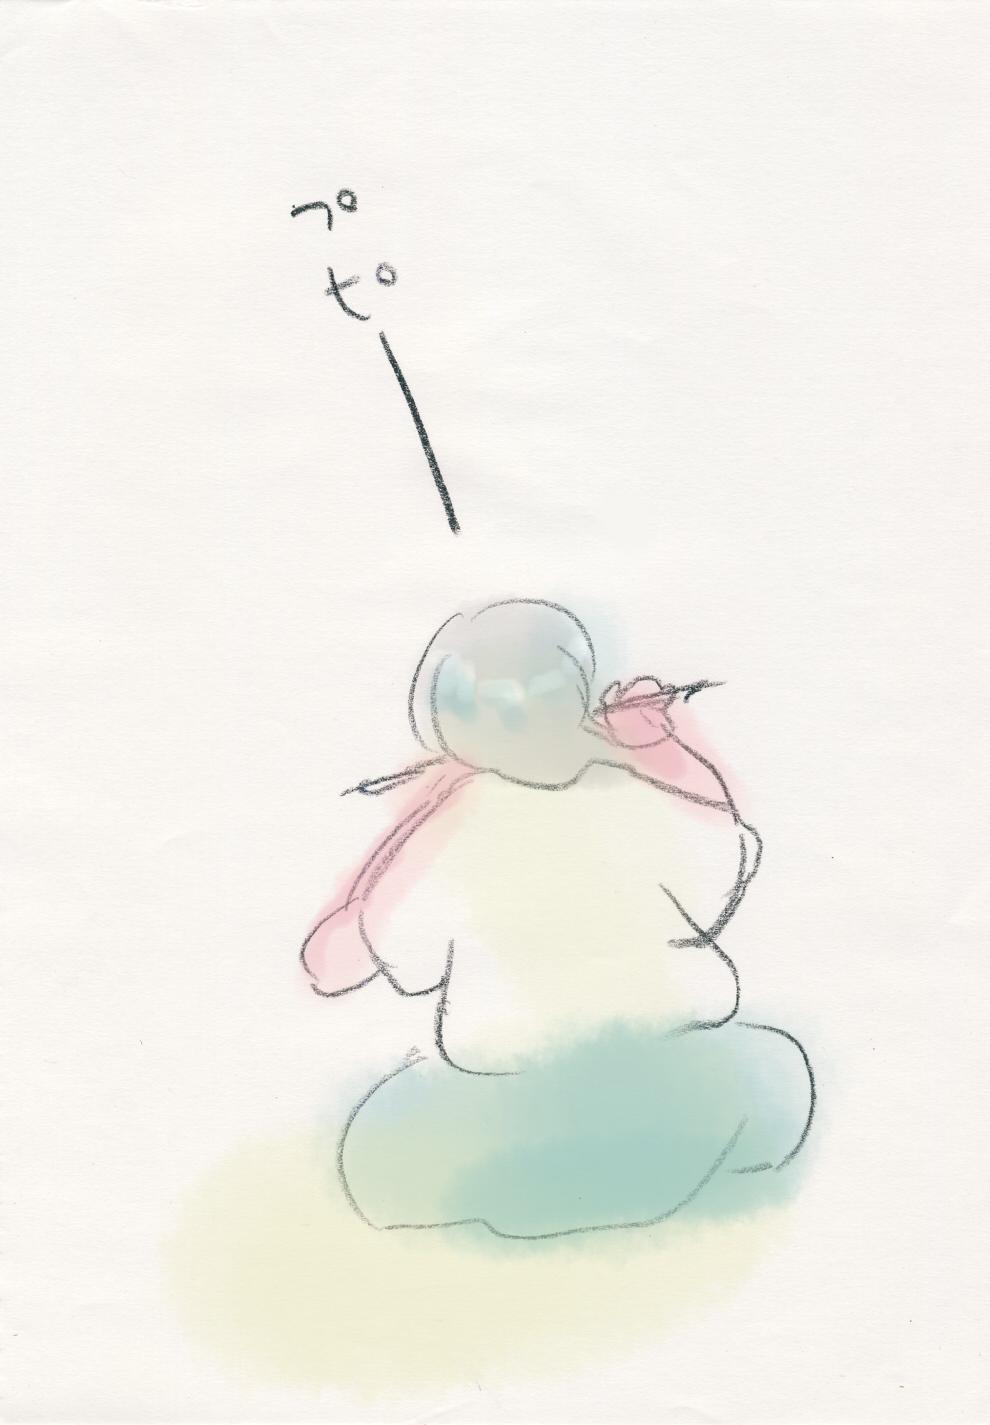 http://ahito.com/comic/ehon/kamiuta/img/20170808/03.jpg